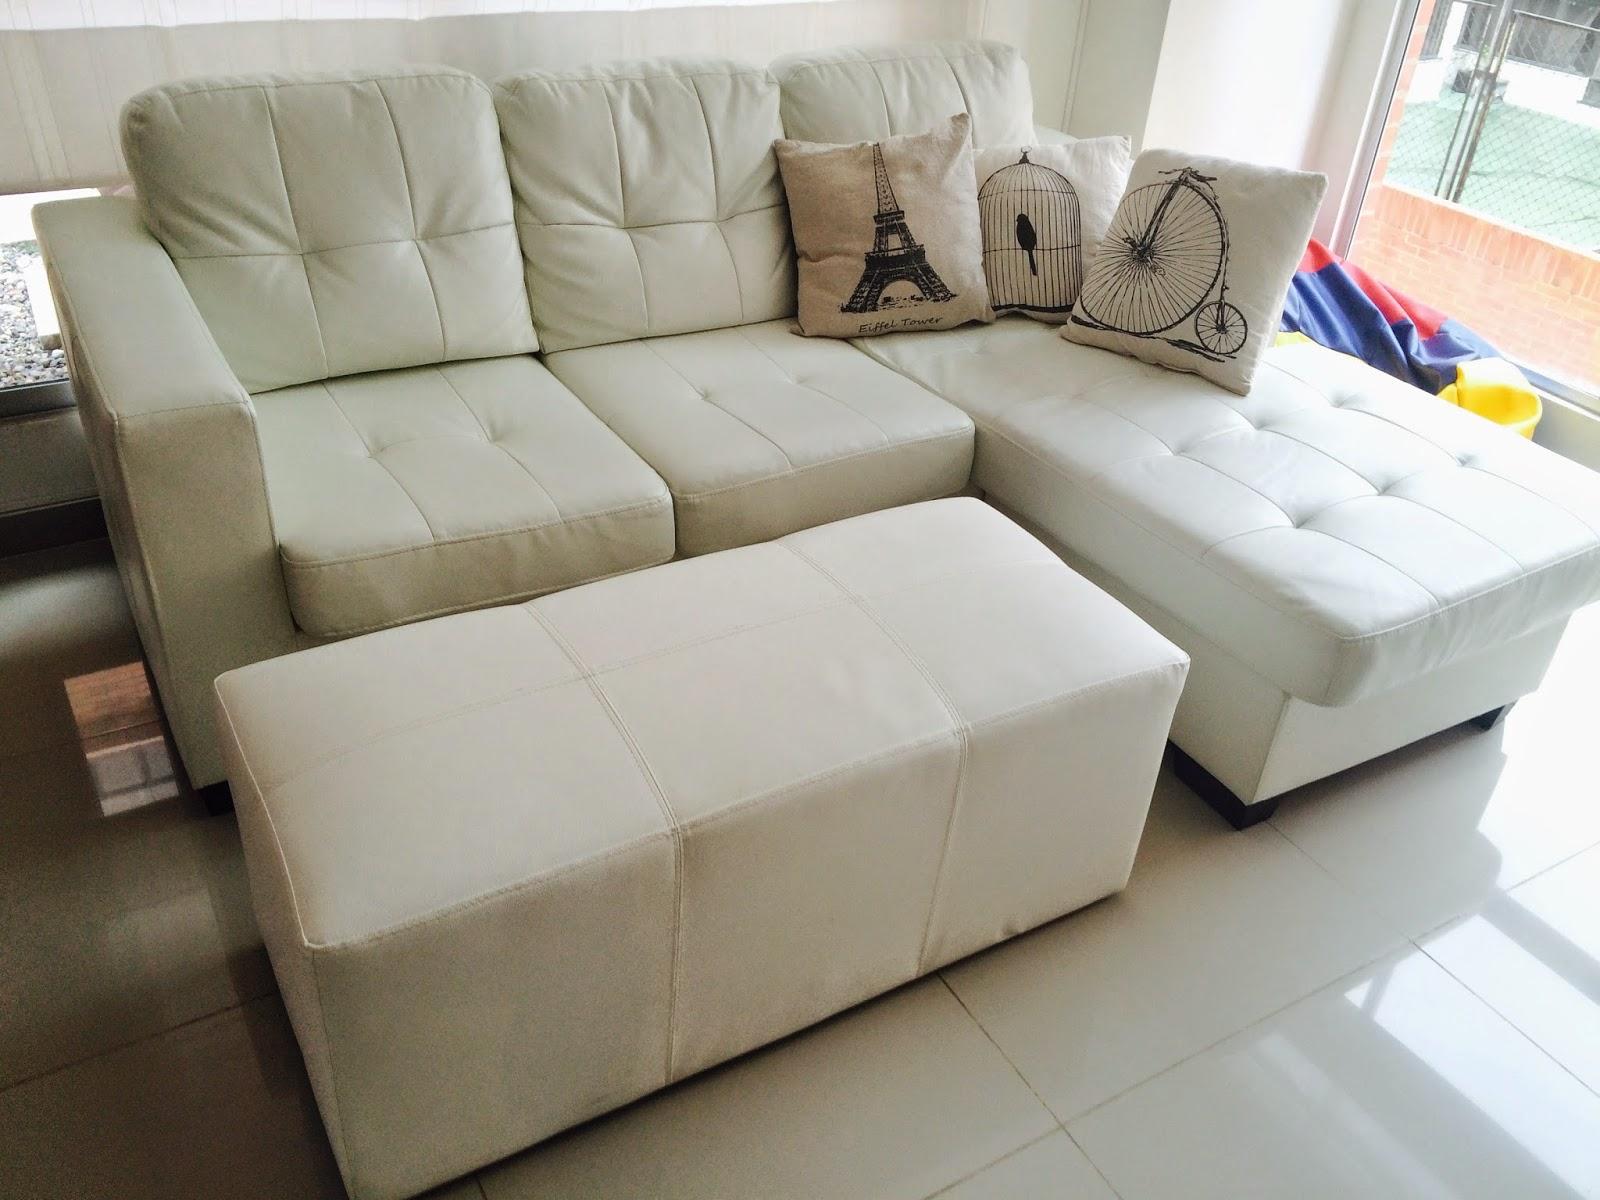 sofa cama bogota venta outdoor sofas and loveseats de garaje juego sofá 43poltrona 43cojines